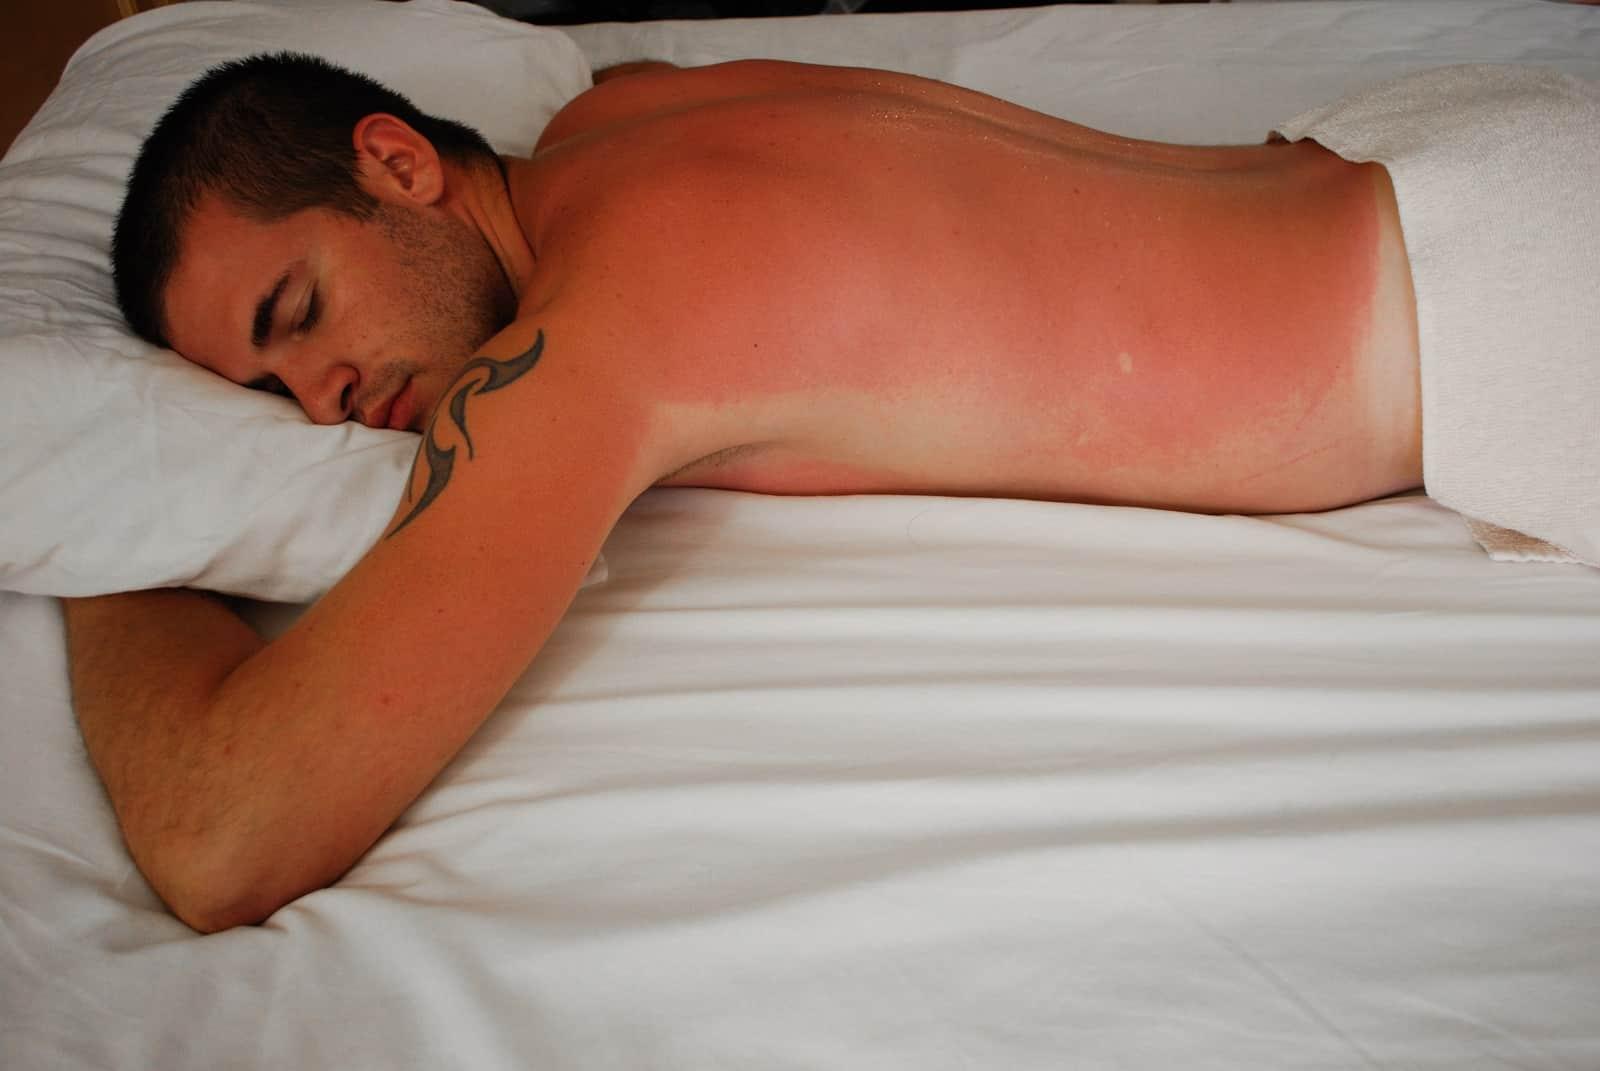 HOW TO SLEEP WITH SUNBURN EASILY